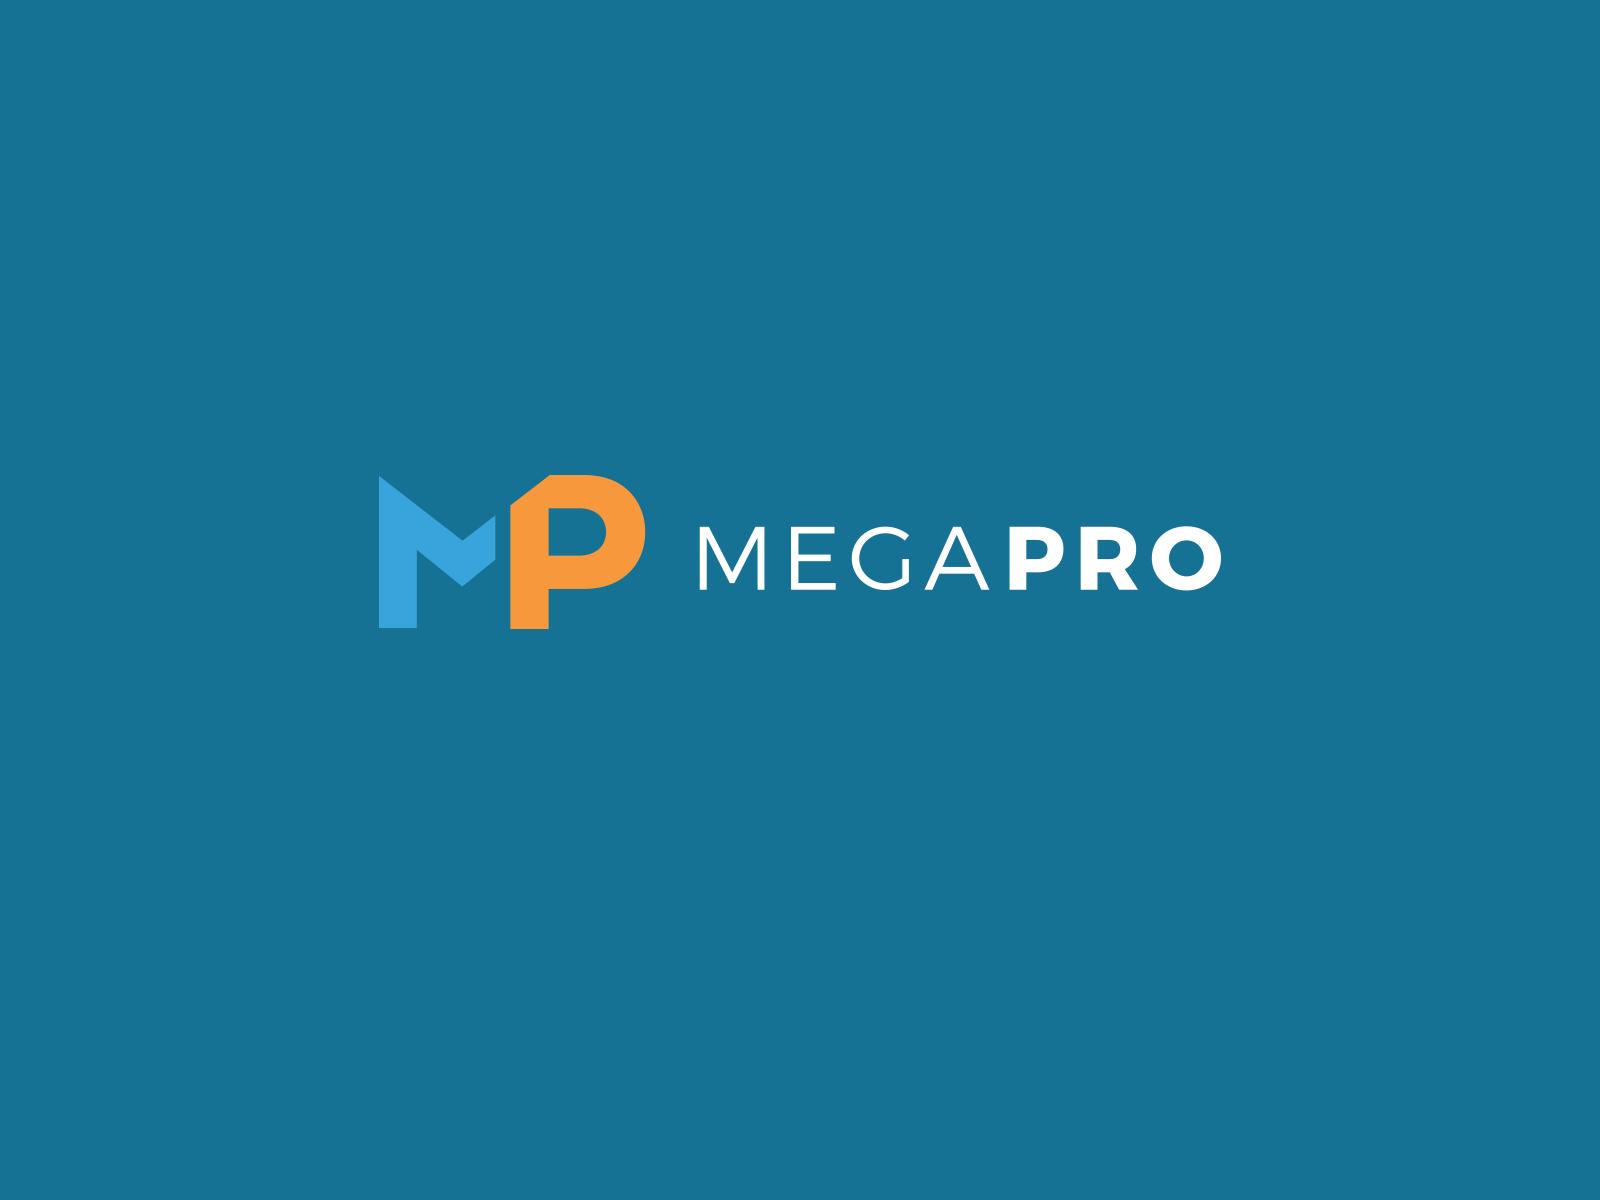 MegaPro Logotype